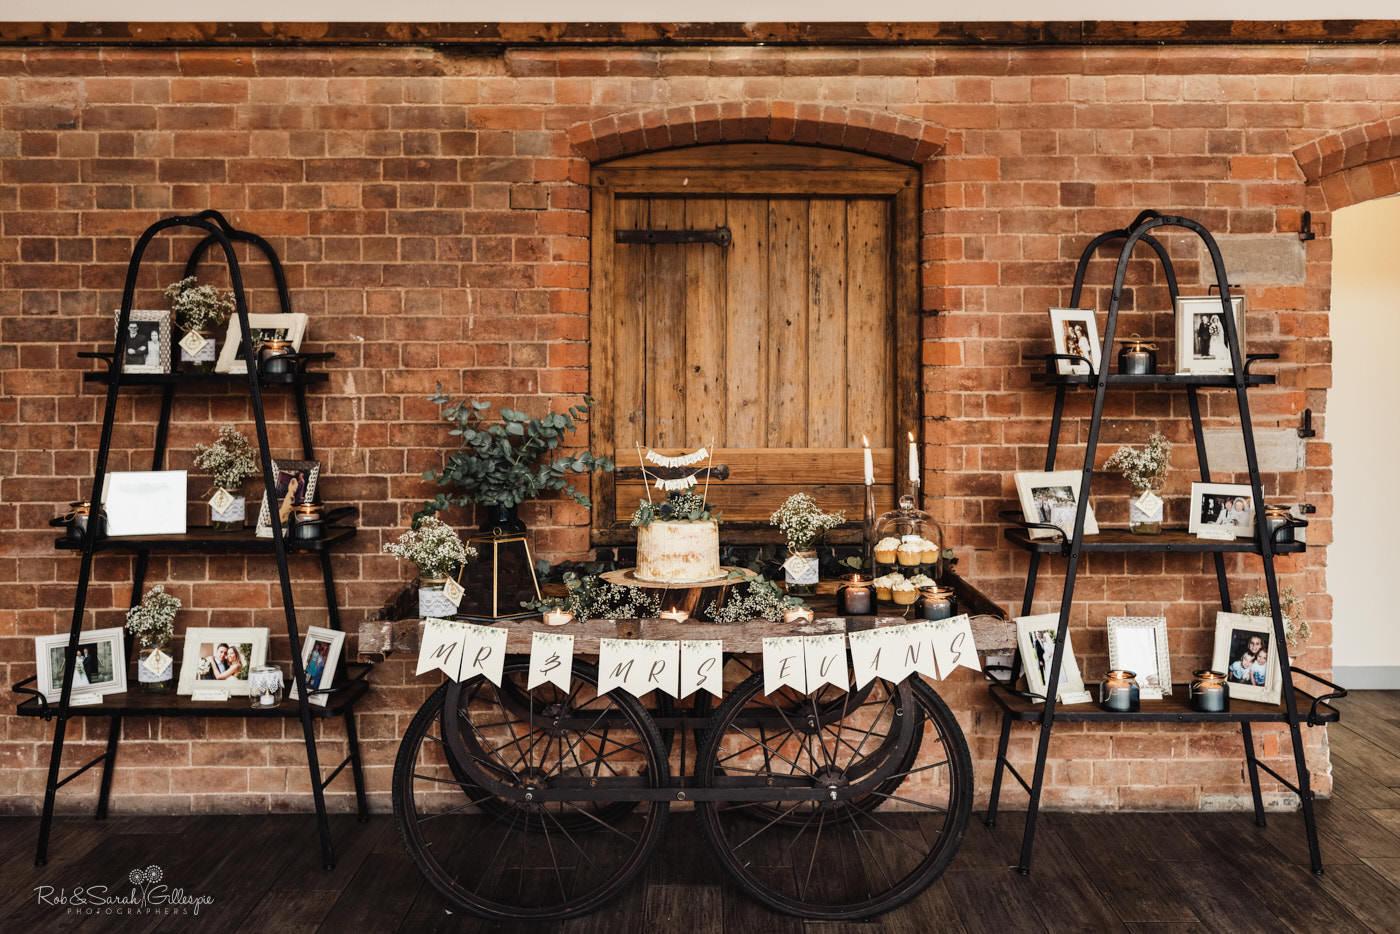 Wedding cake at Swallows Nest Barn in Warwickshire